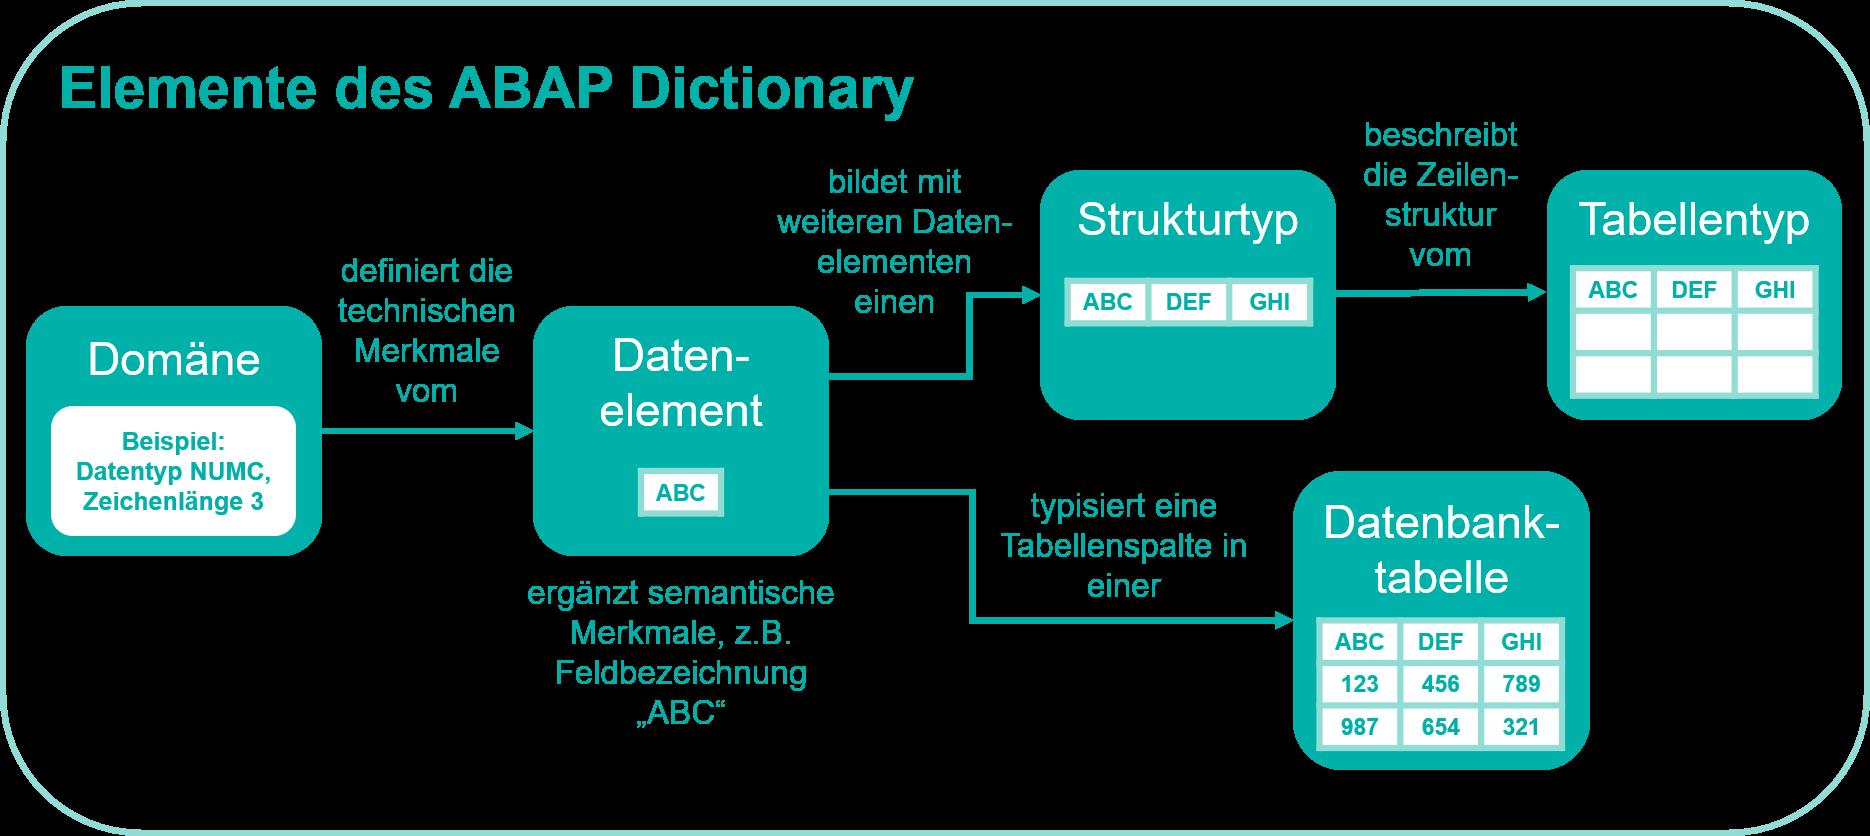 Elemente des ABAP Dictionary im Zusammenhang